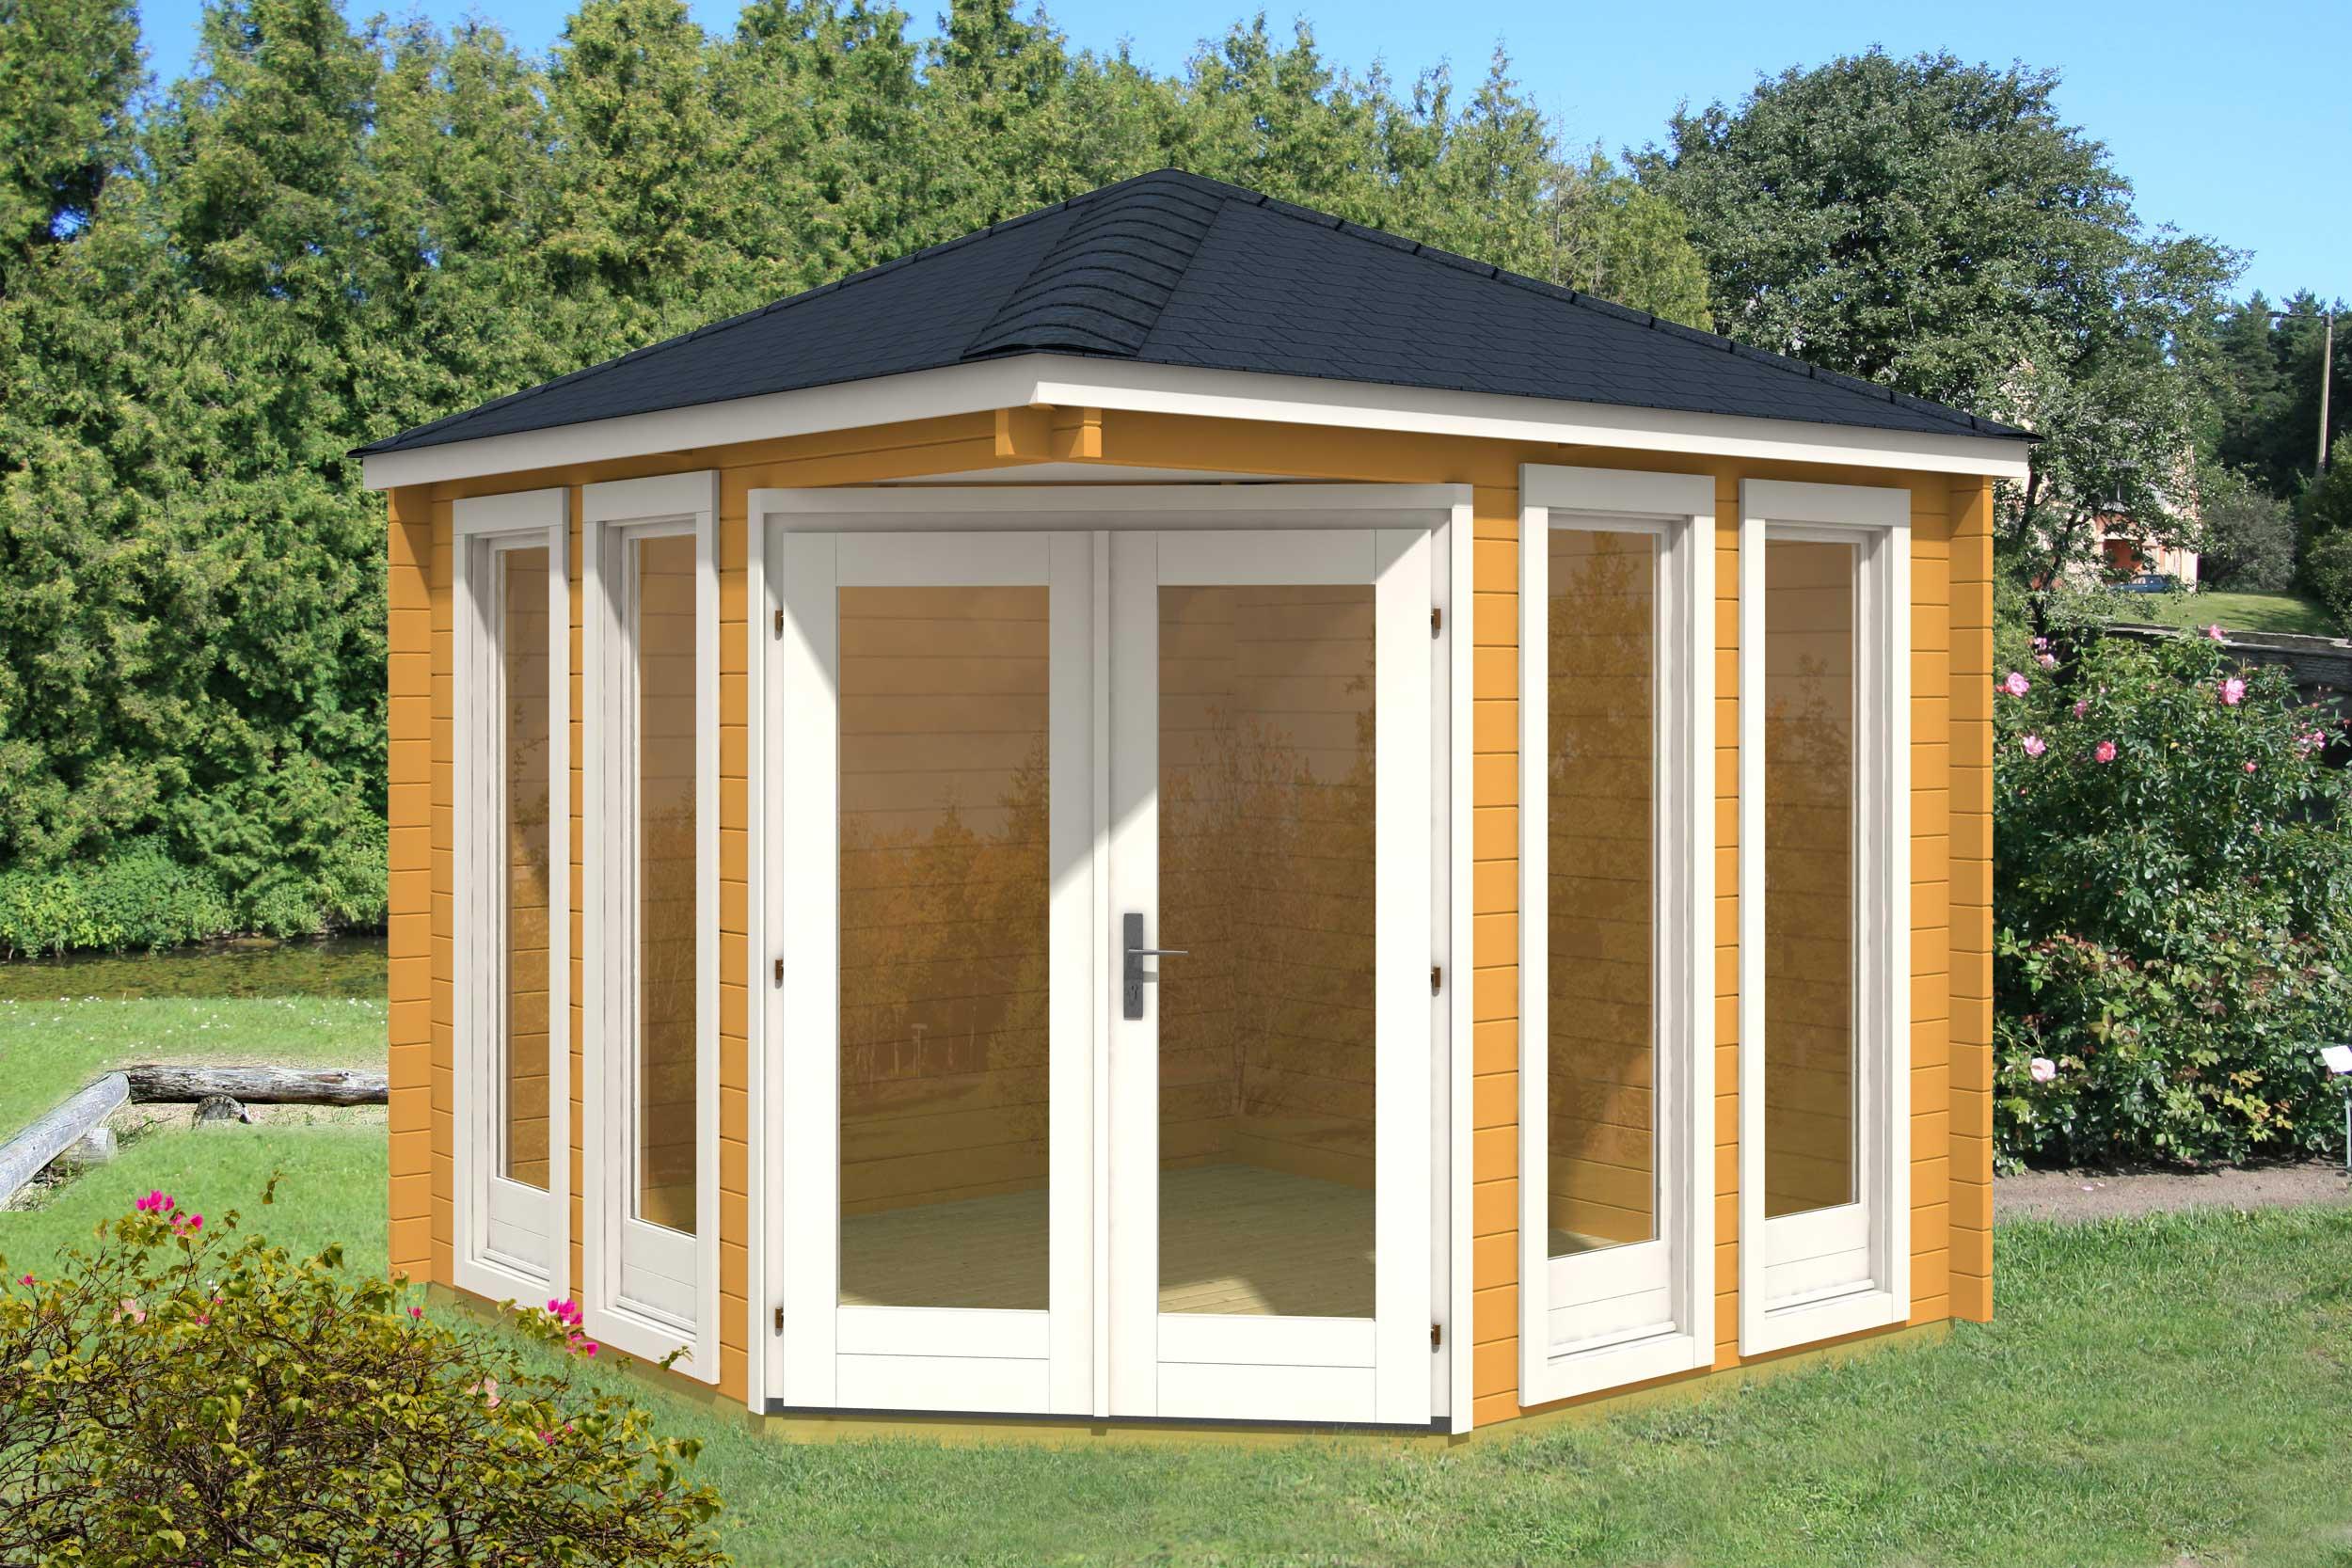 Prefabricated Gazebo Pavilion Building Kit